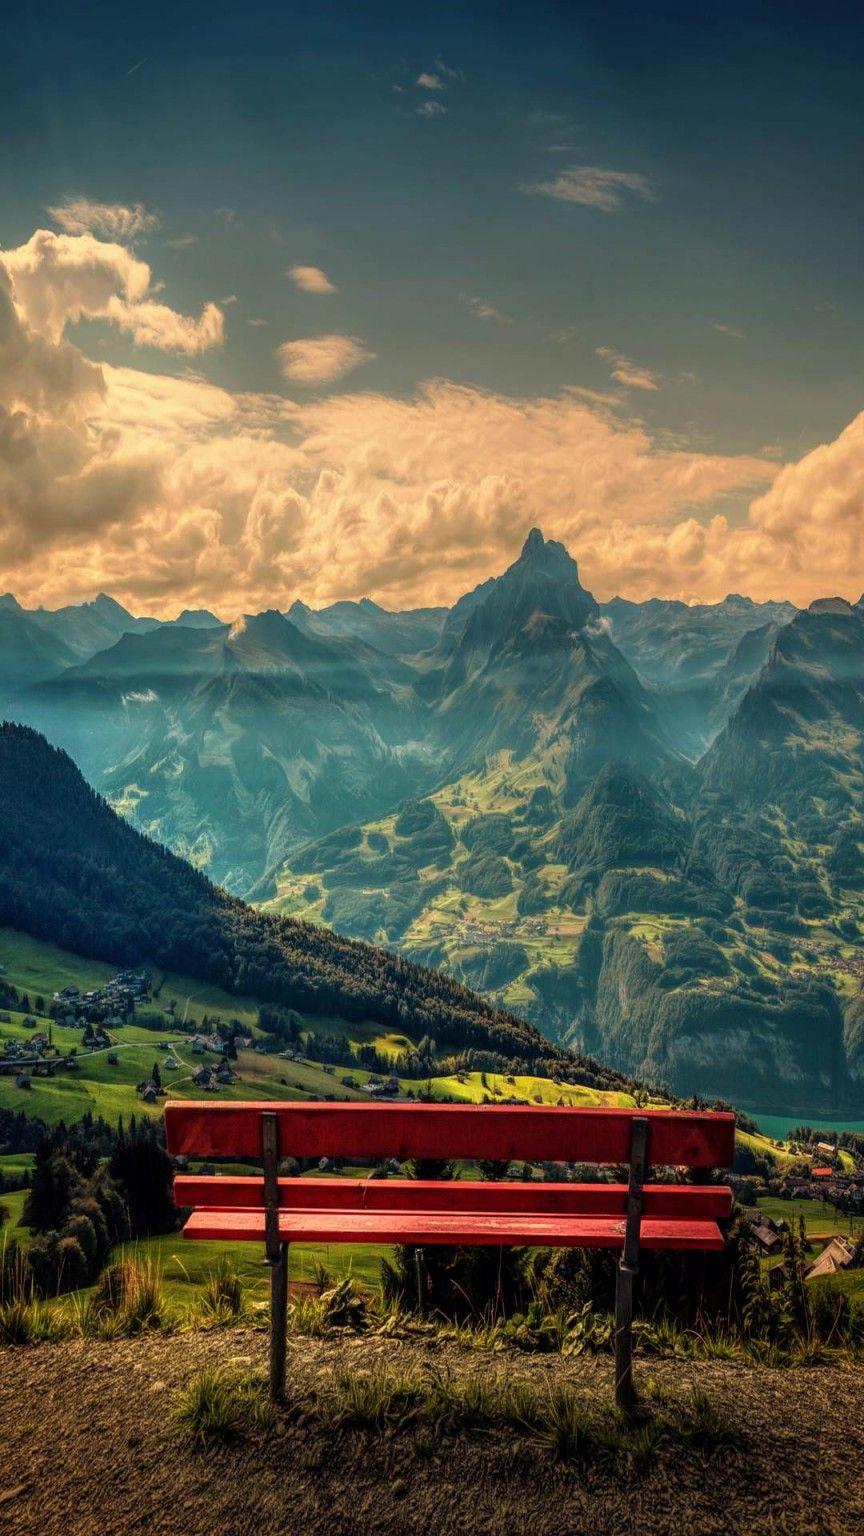 20 Iphone Wallpapers Hd Quality Free Download Beautiful Landscape Wallpaper Scenery Wallpaper Volcano Wallpaper